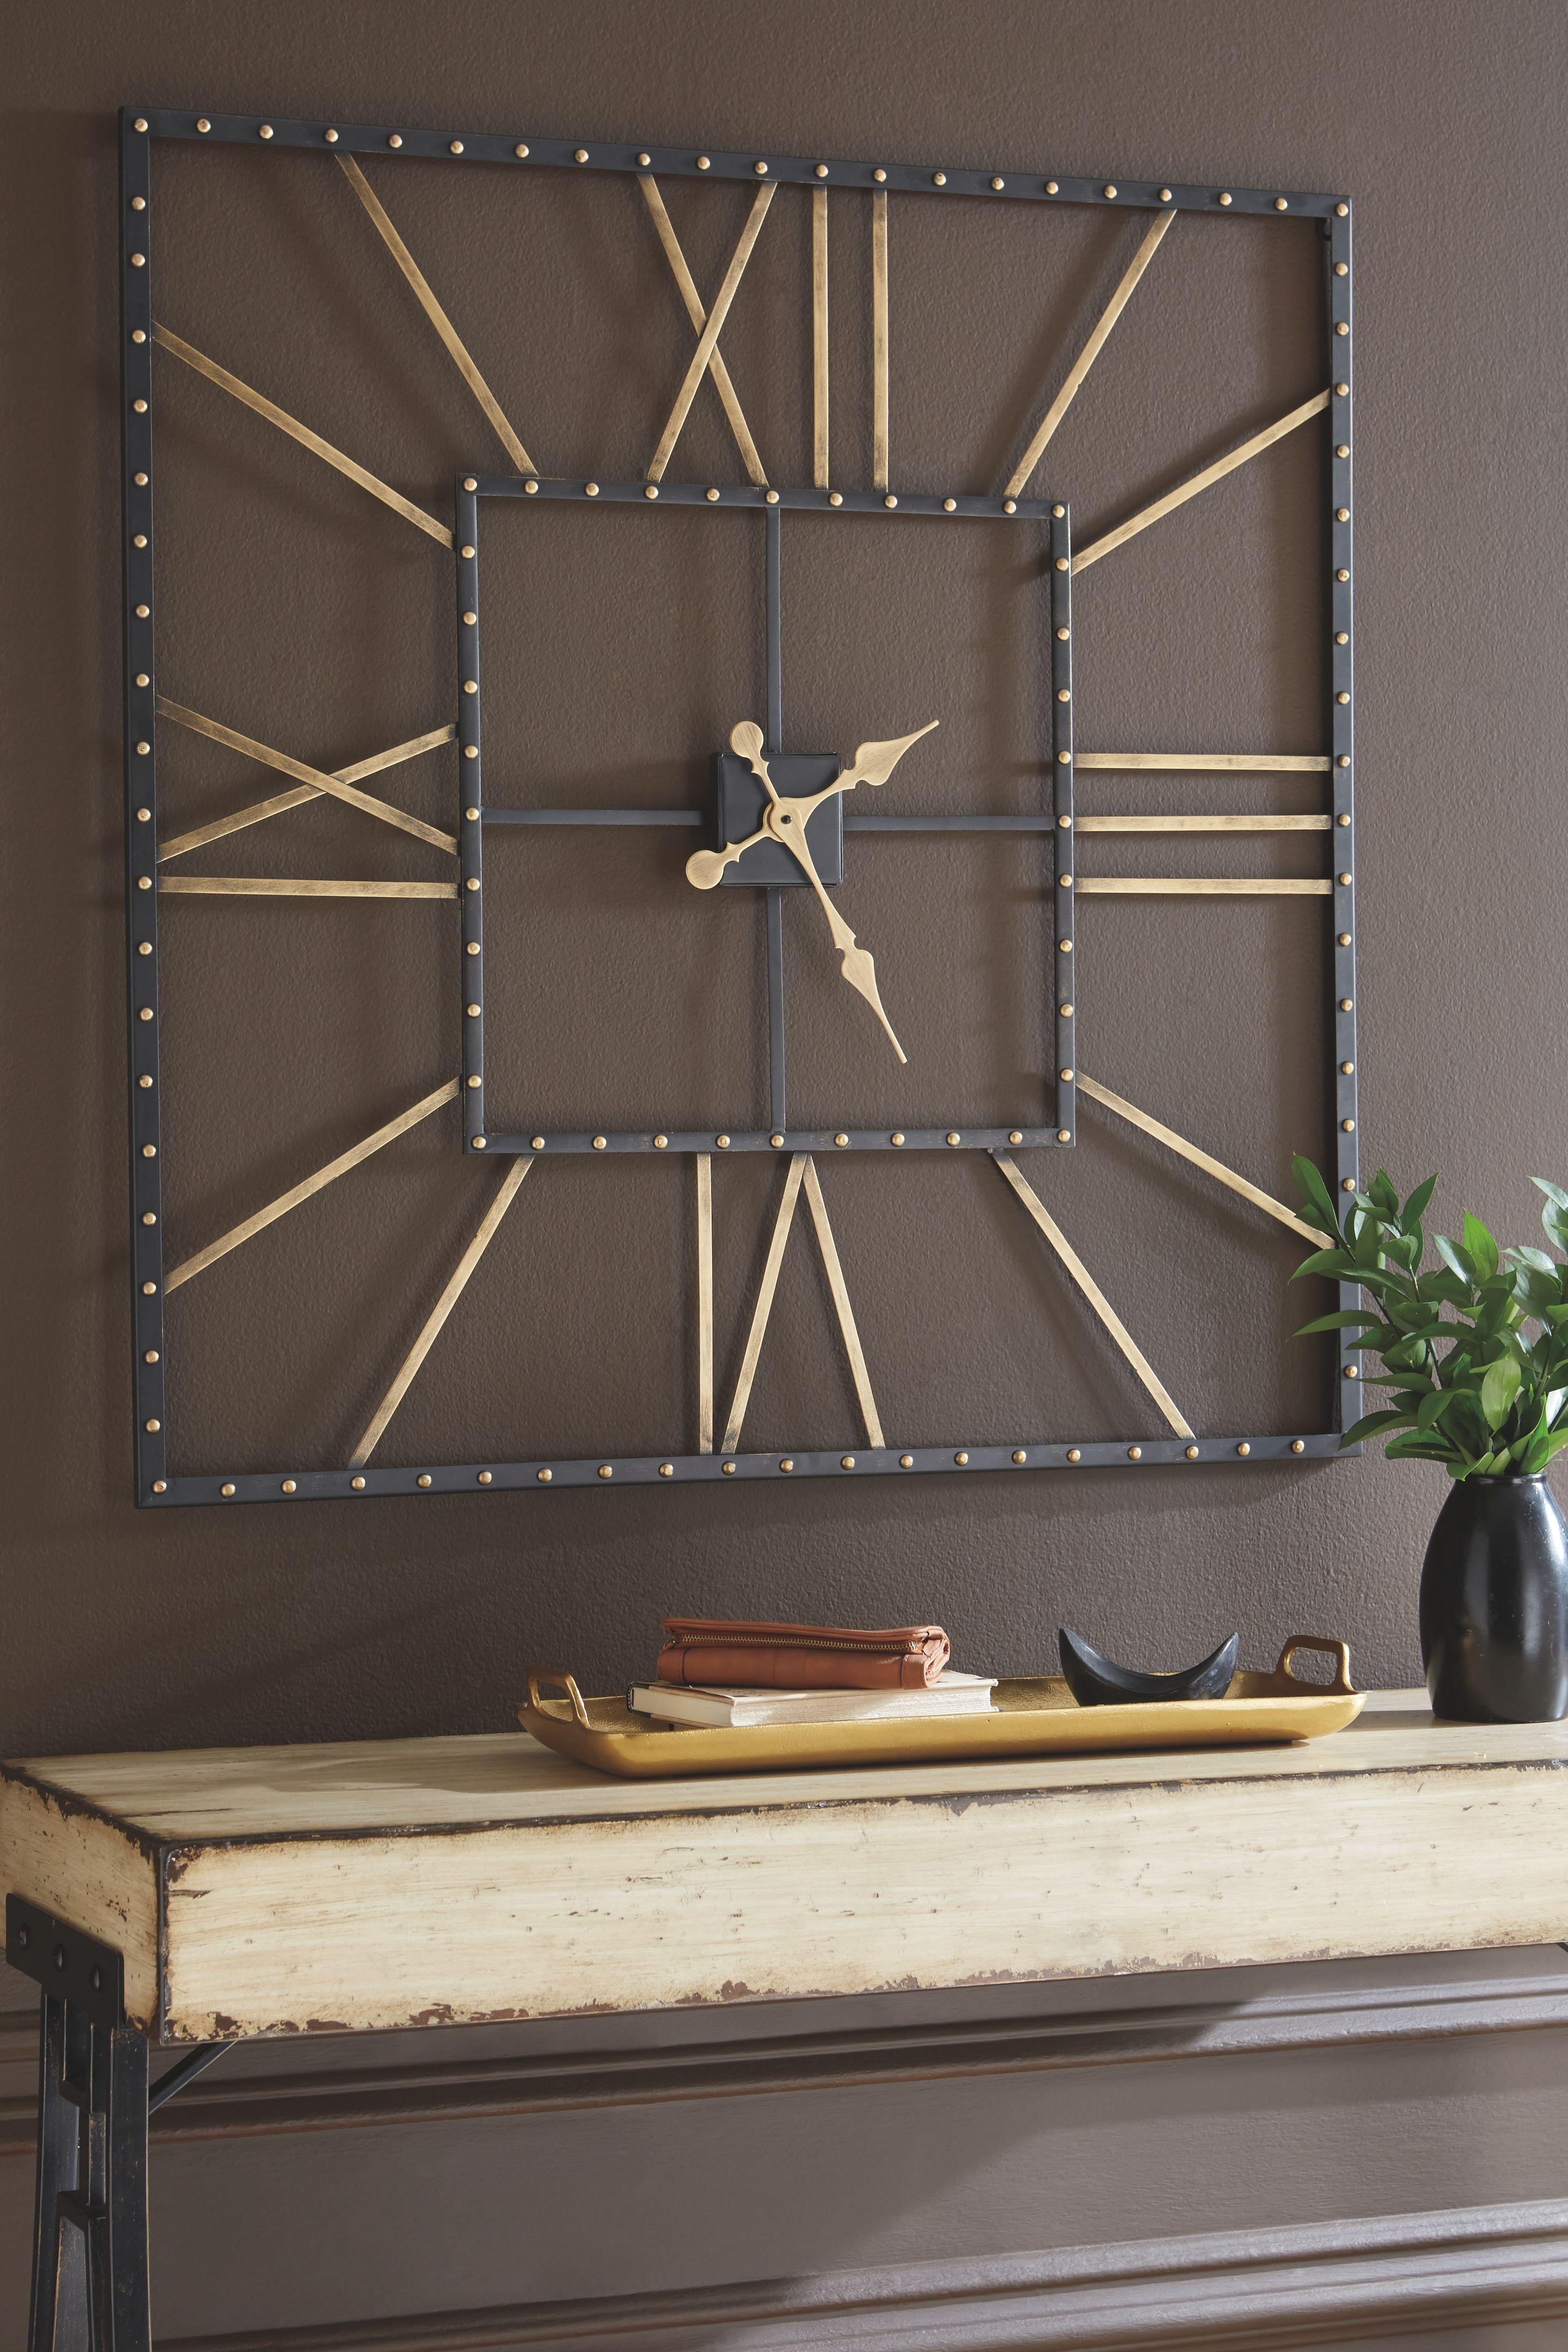 Thames Wall Clock Black Gold Finish Diy Clock Wall Clock Wall Decor Wall Clock Design